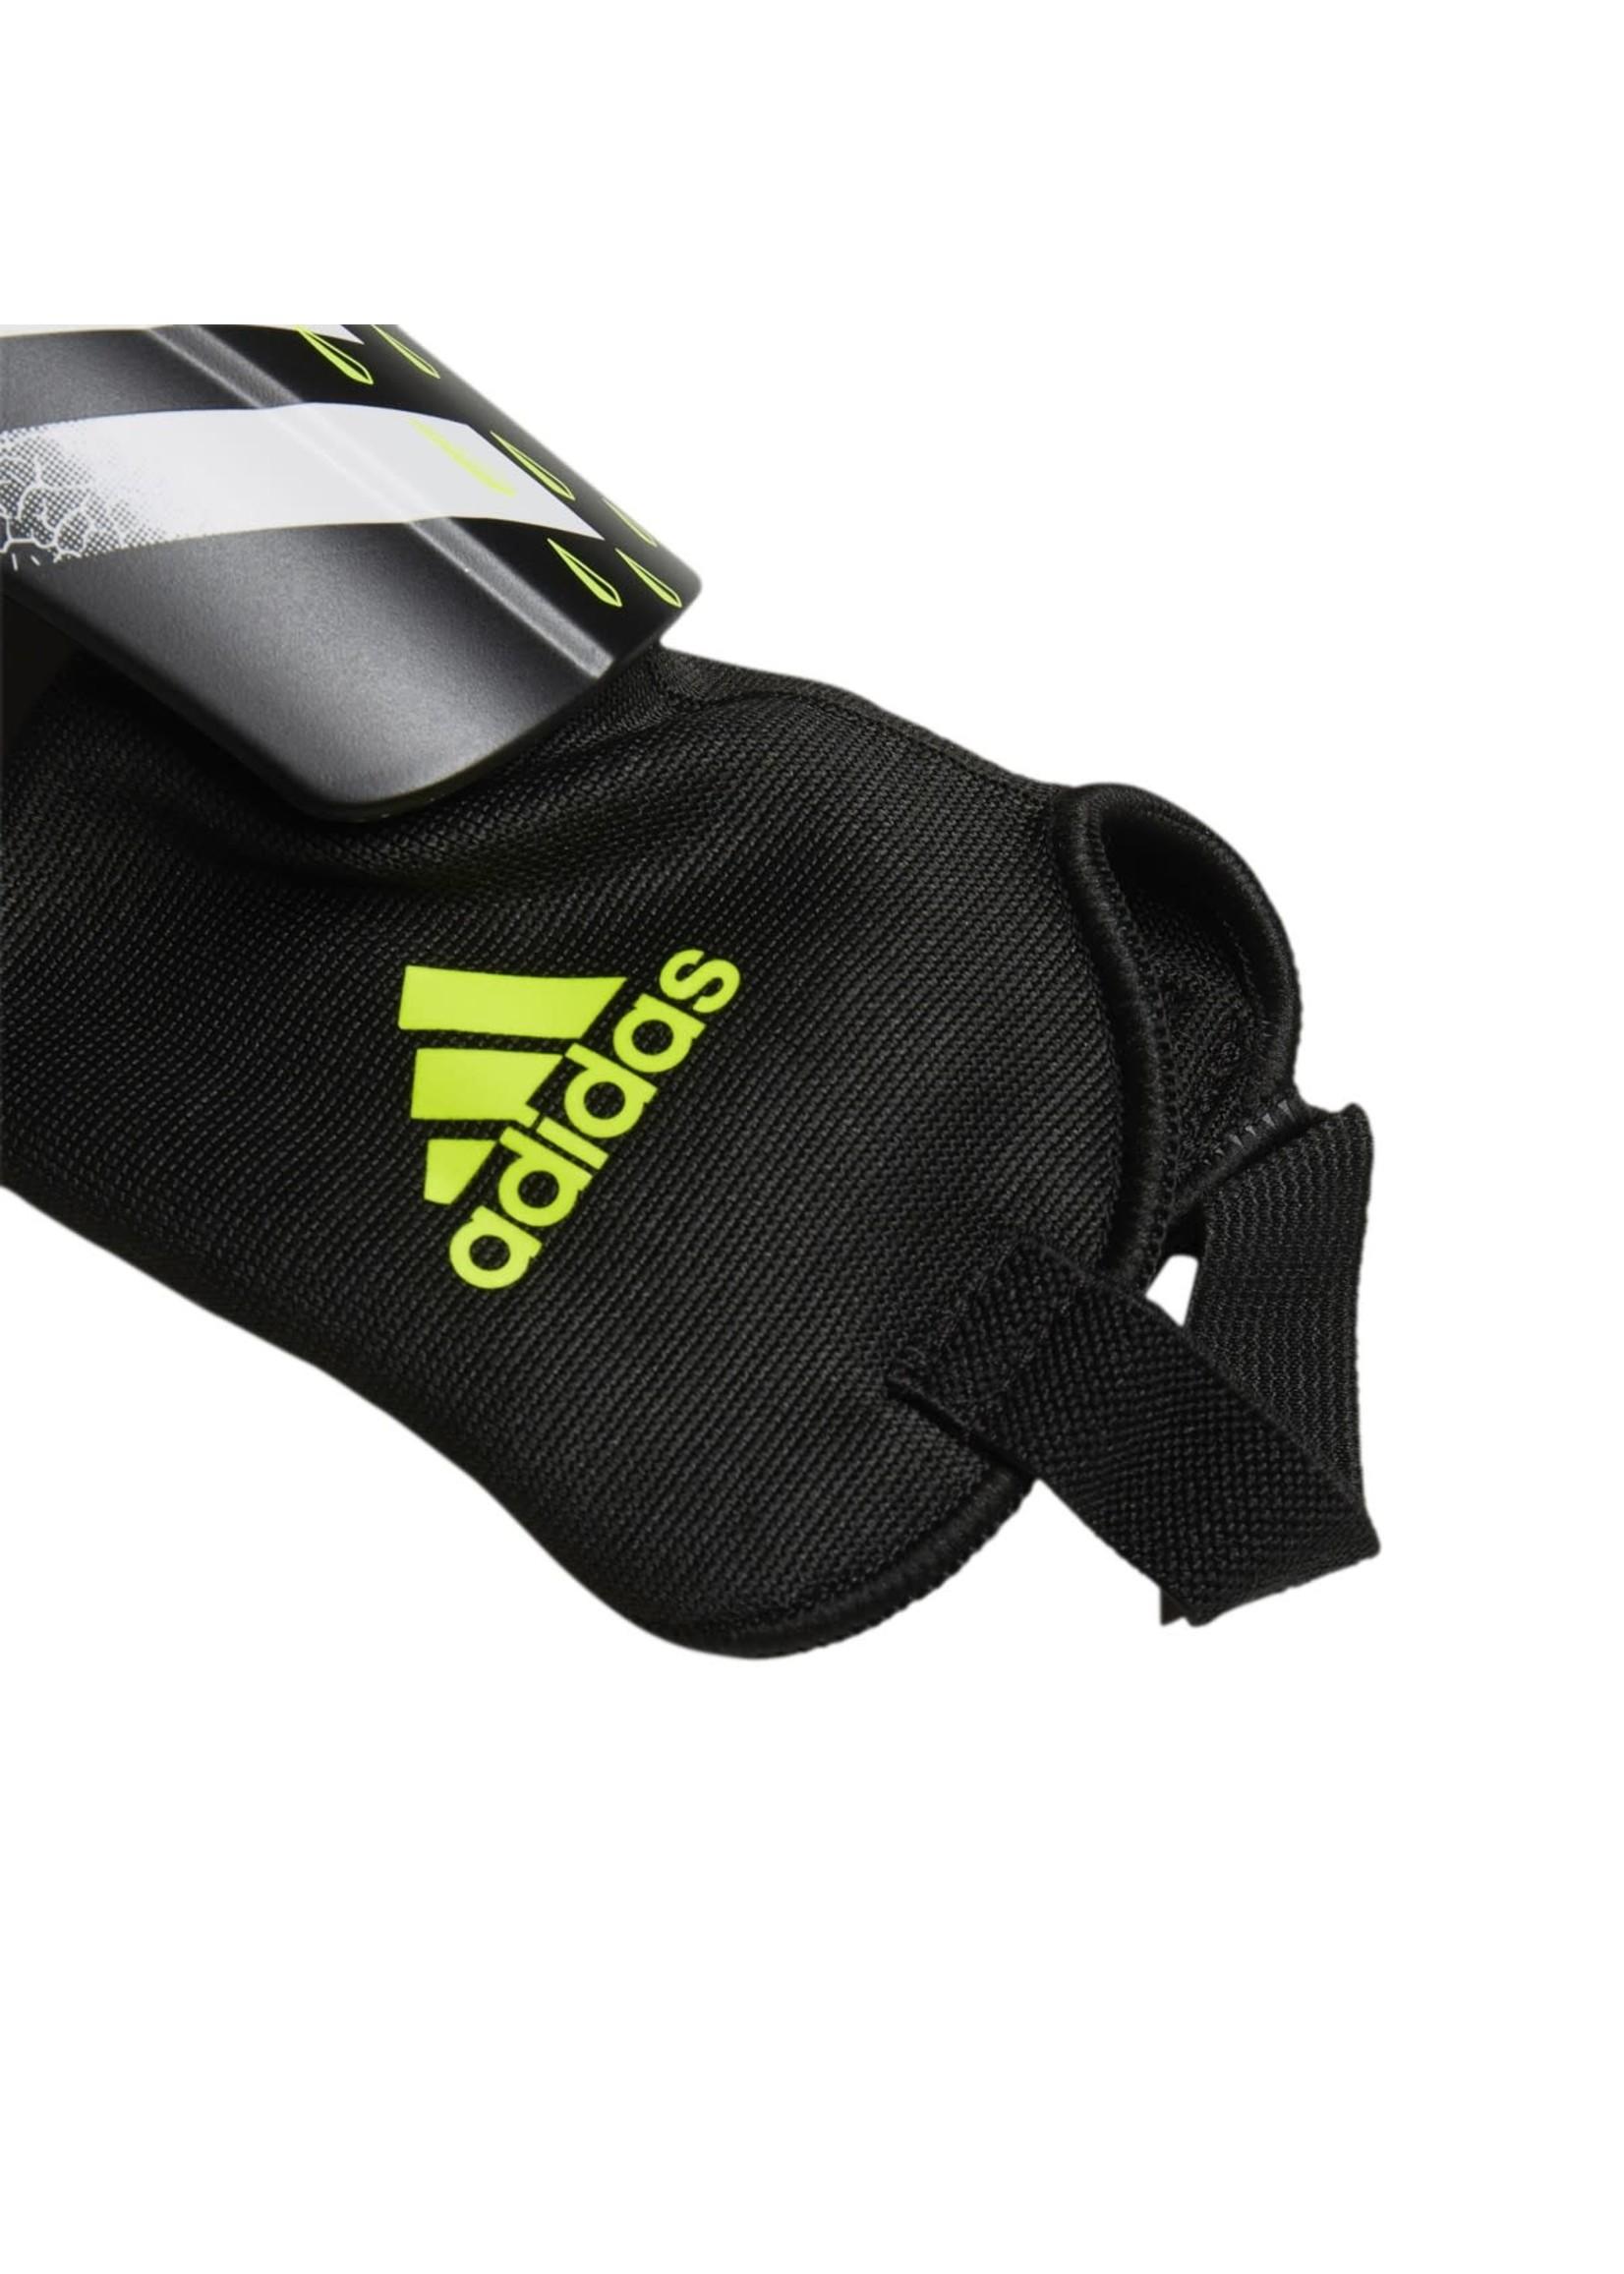 Adidas PREDATOR20 MATCH